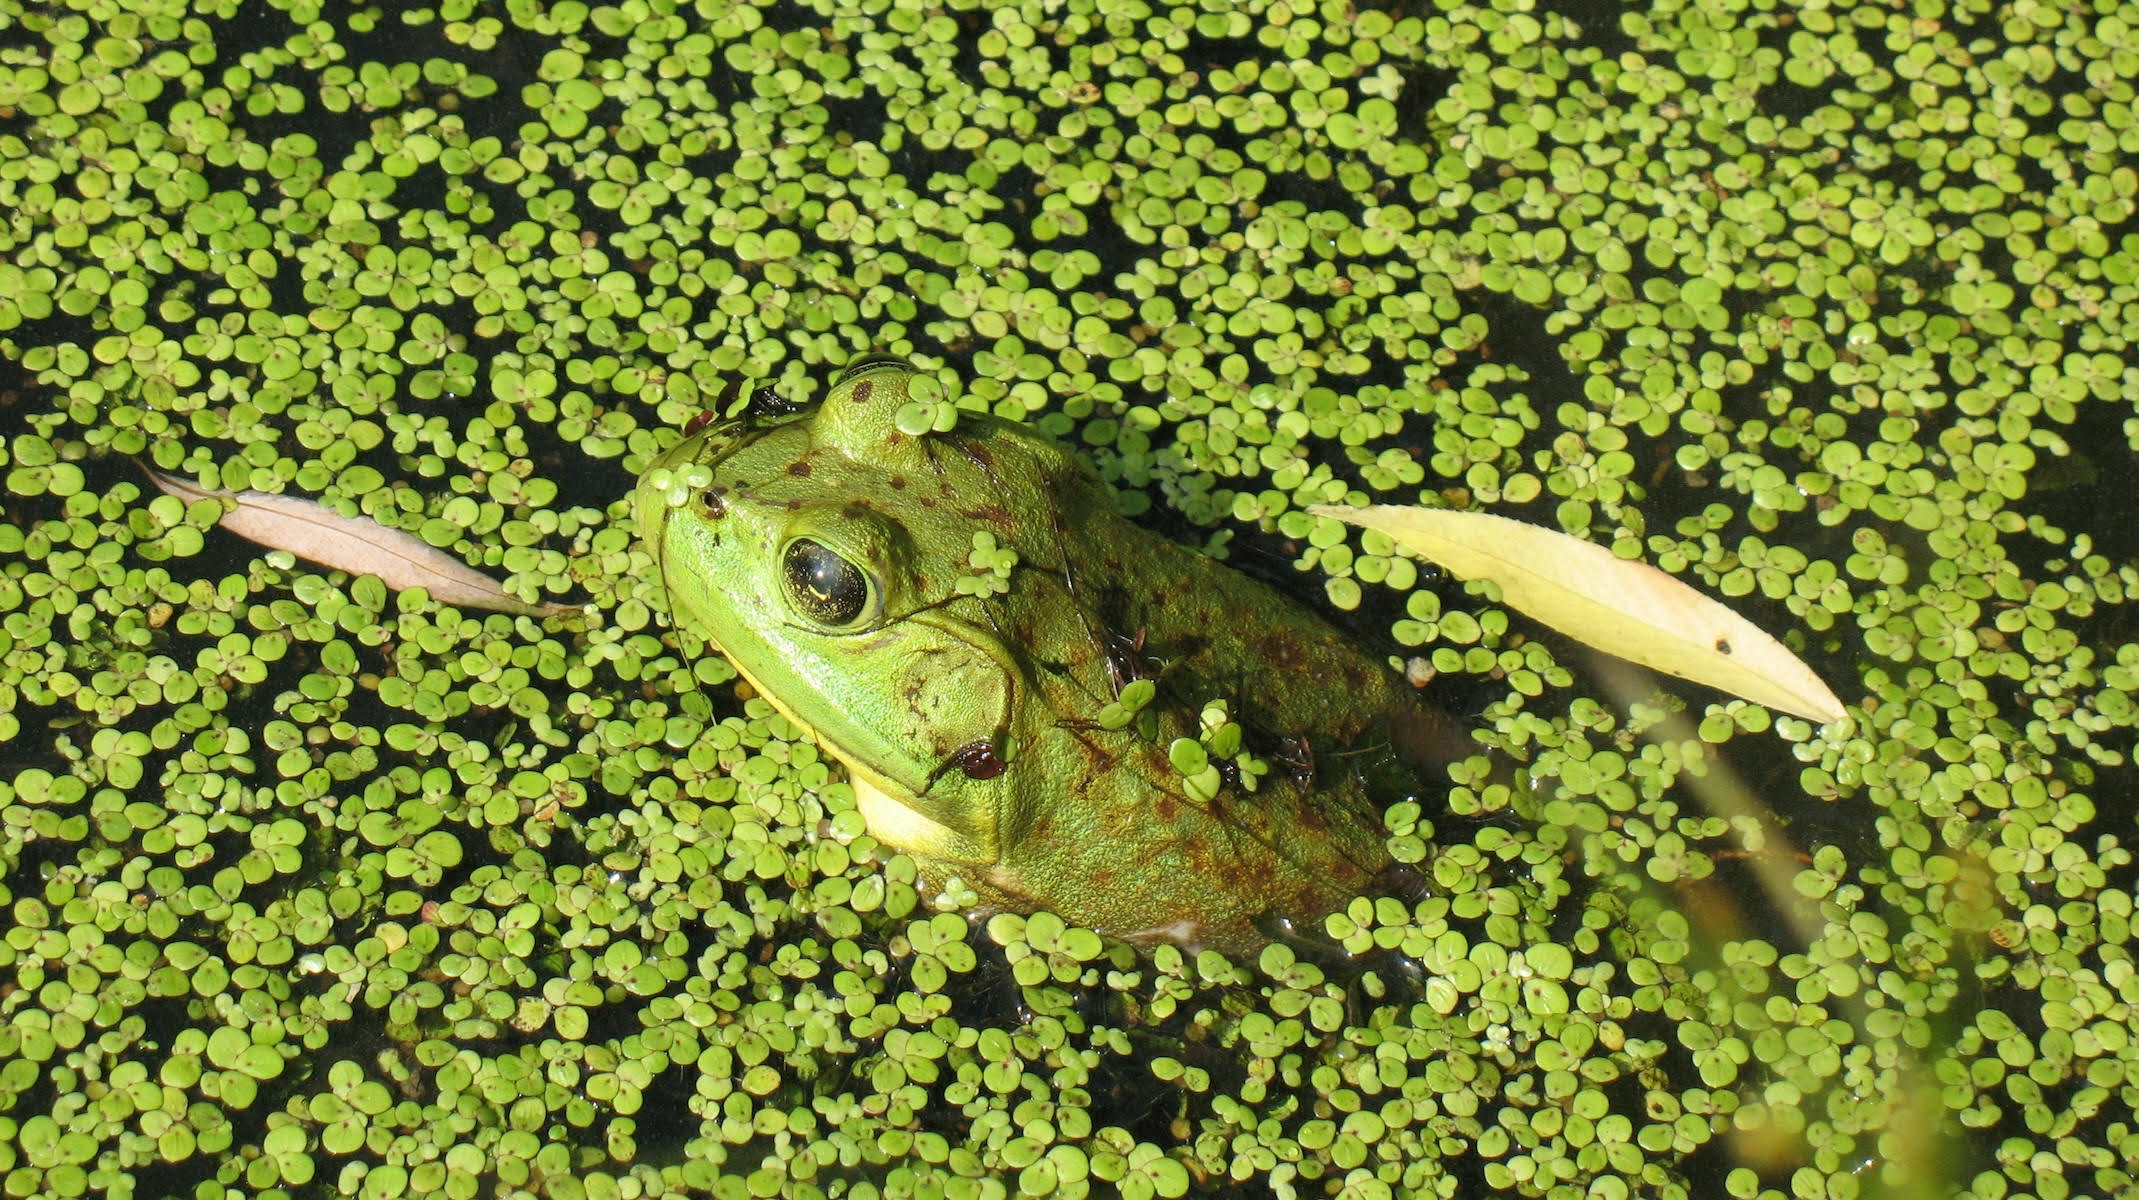 duckweed frog closeup.jpg